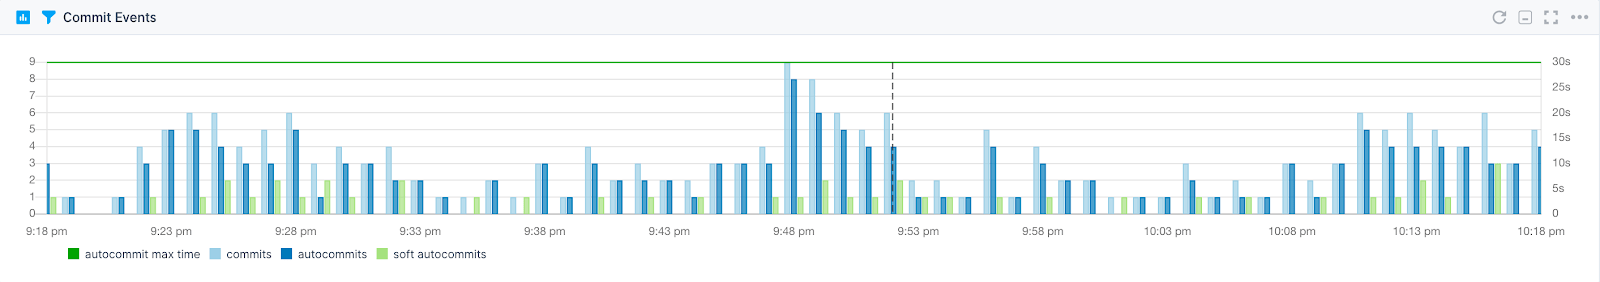 key solr metrics to monitor performance